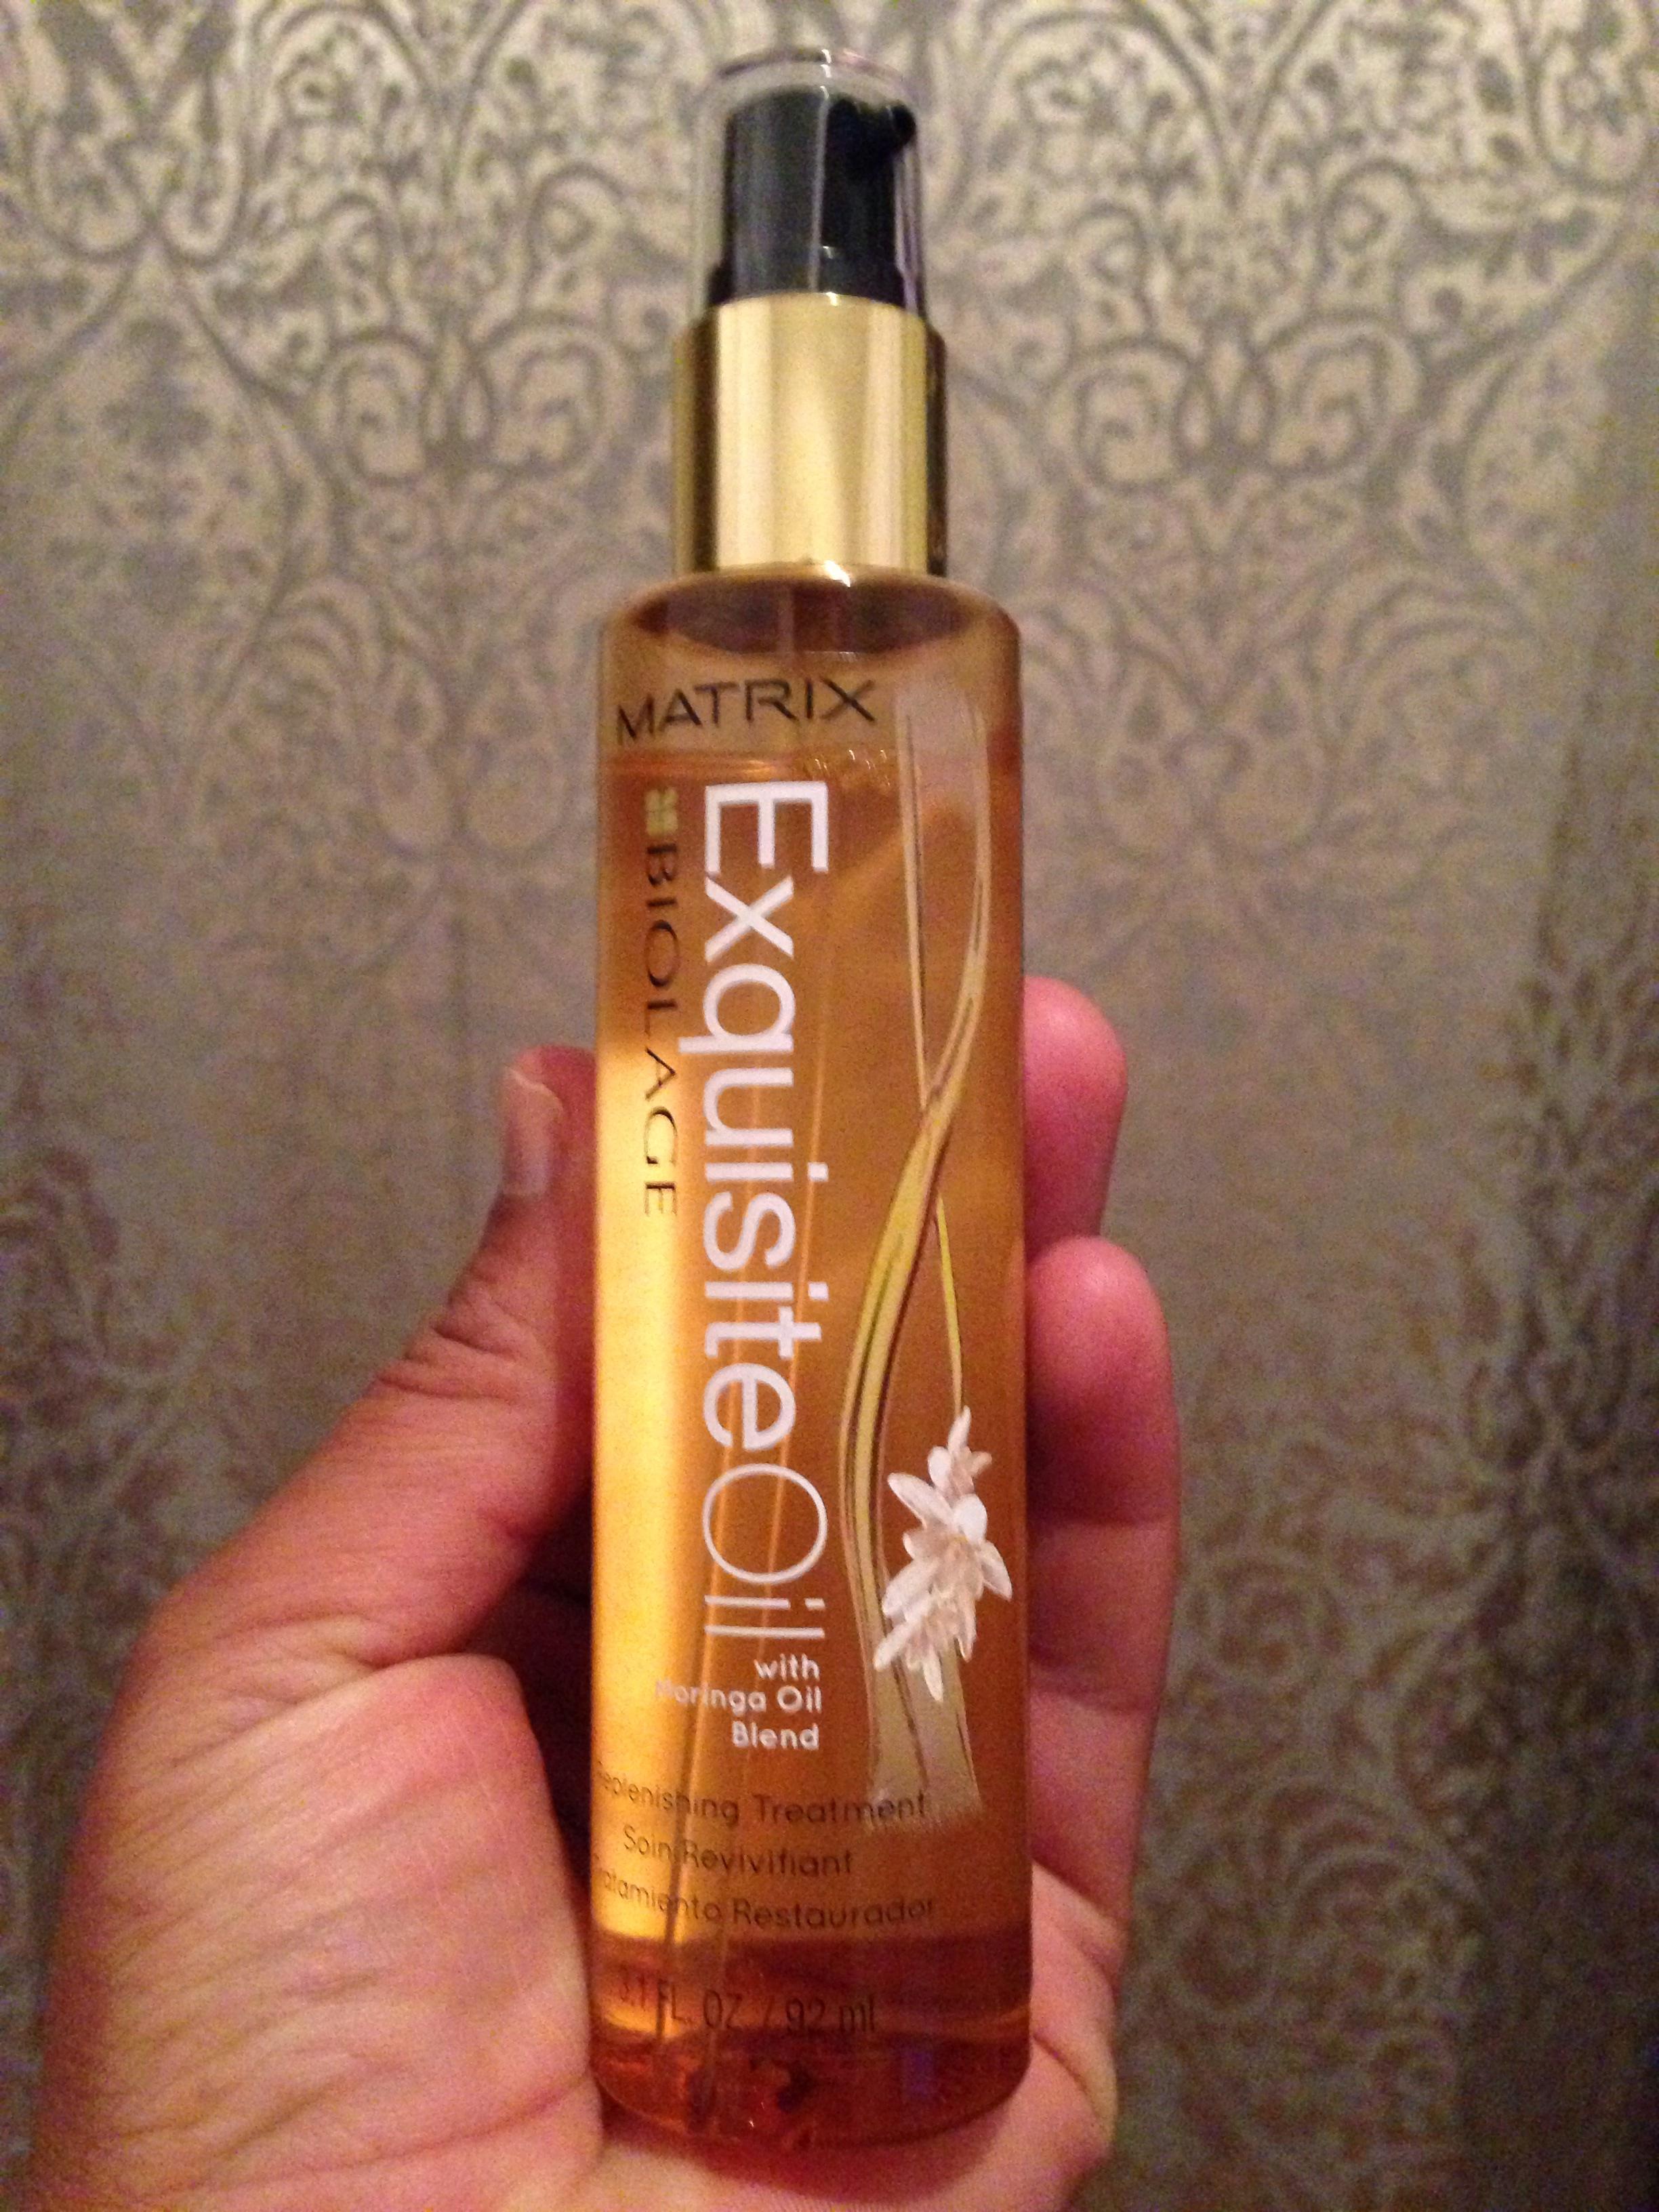 Review On Matrix Biolage Exquisite Oil Glammed Up Me Blog